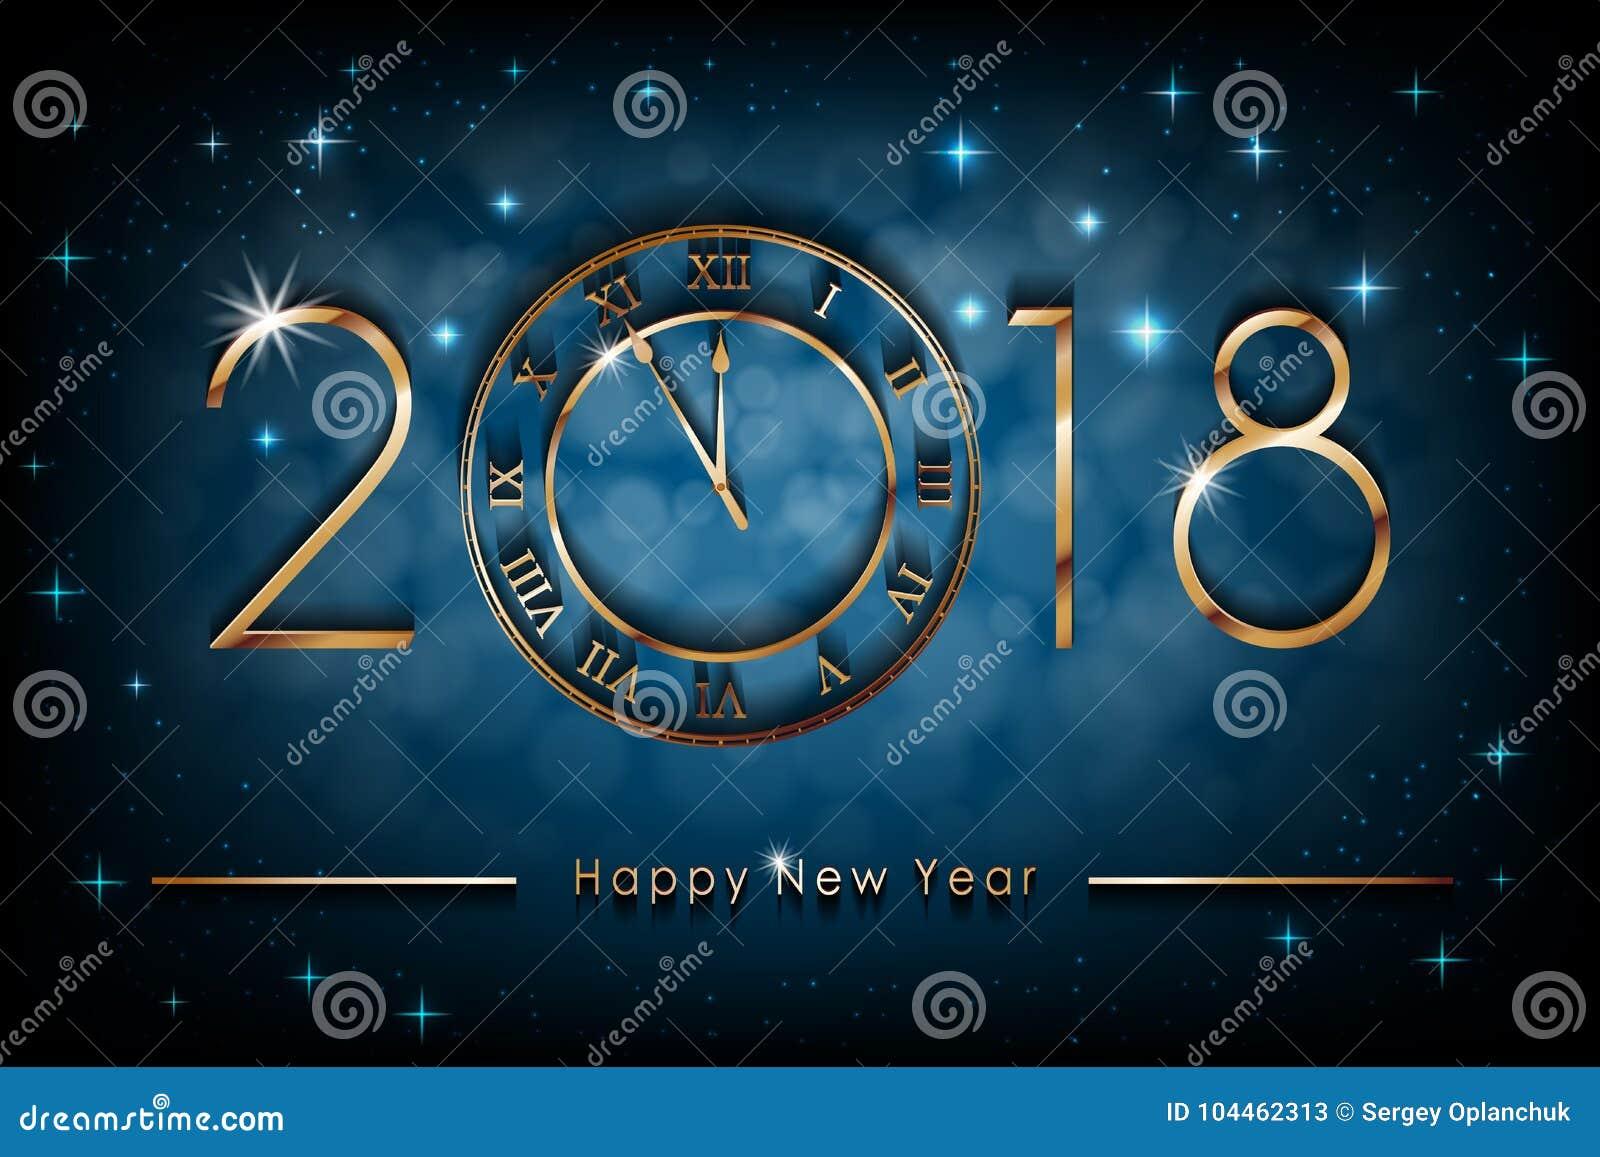 Happy New 2018 Year Illustration On Blue Shiny Background Greetings